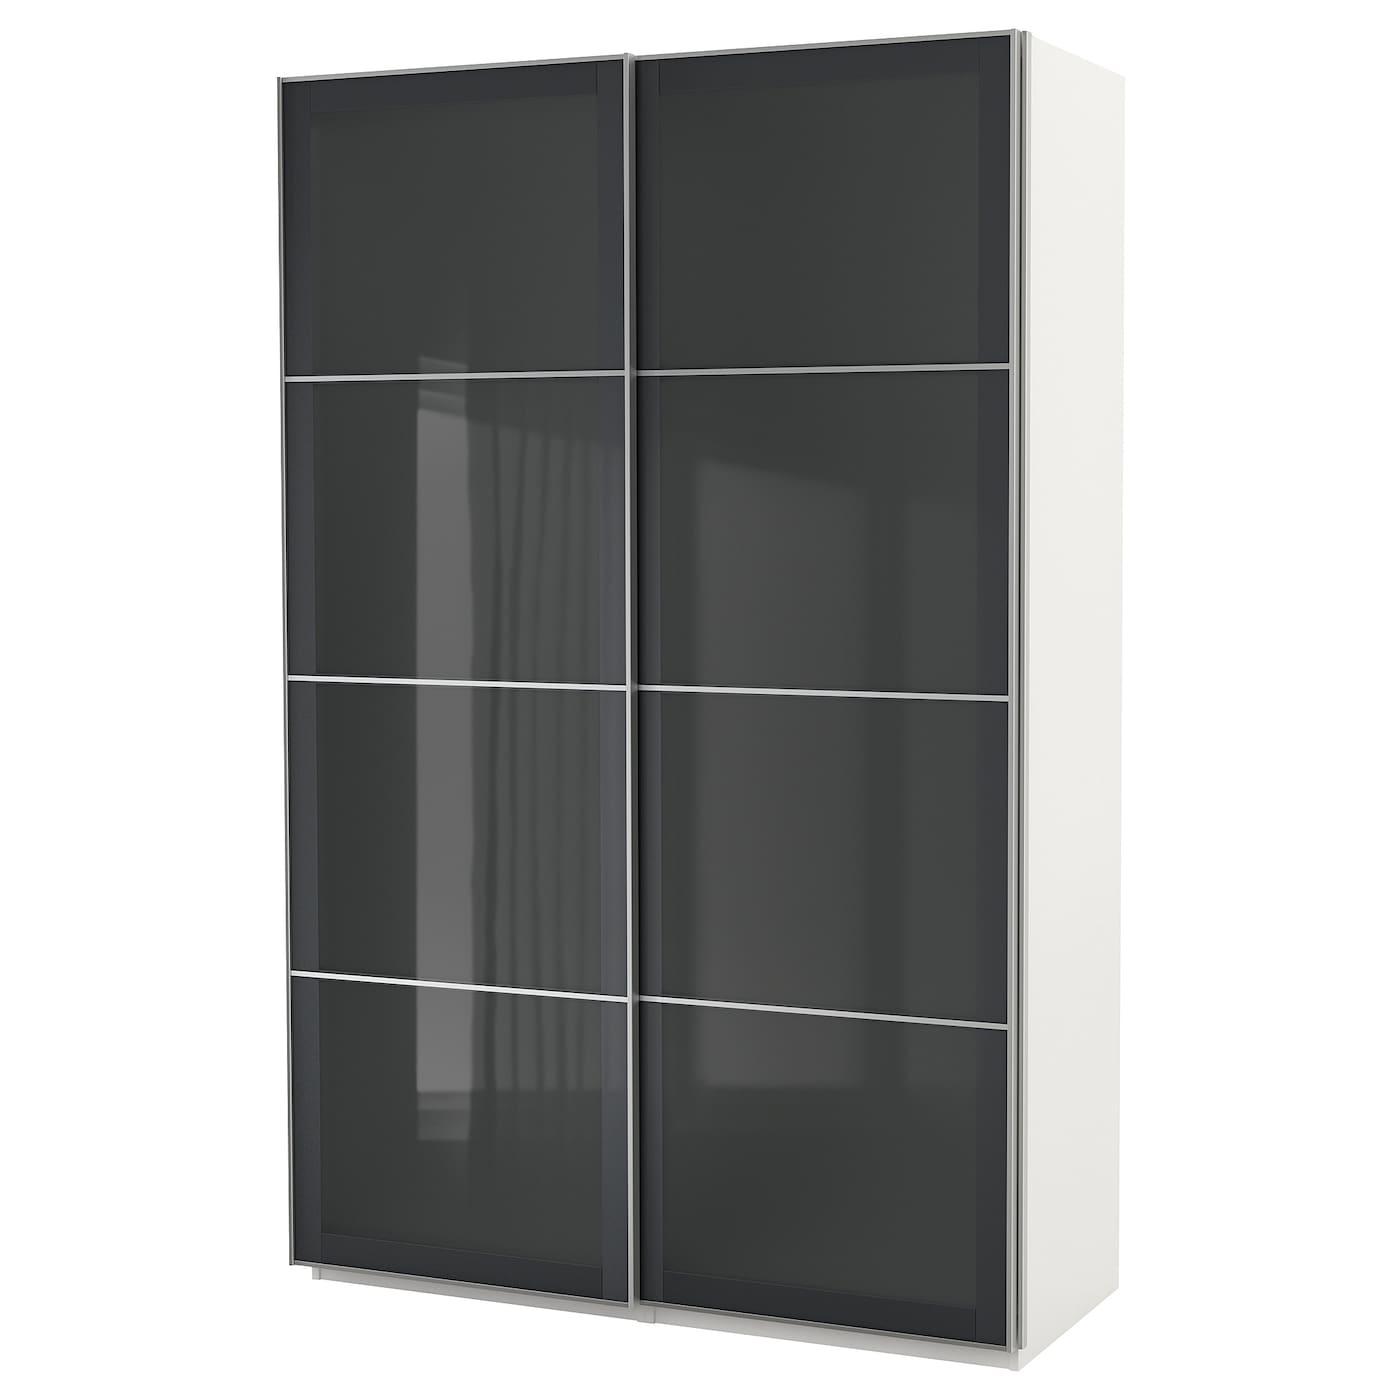 wardrobes wardrobe sale ikea. Black Bedroom Furniture Sets. Home Design Ideas